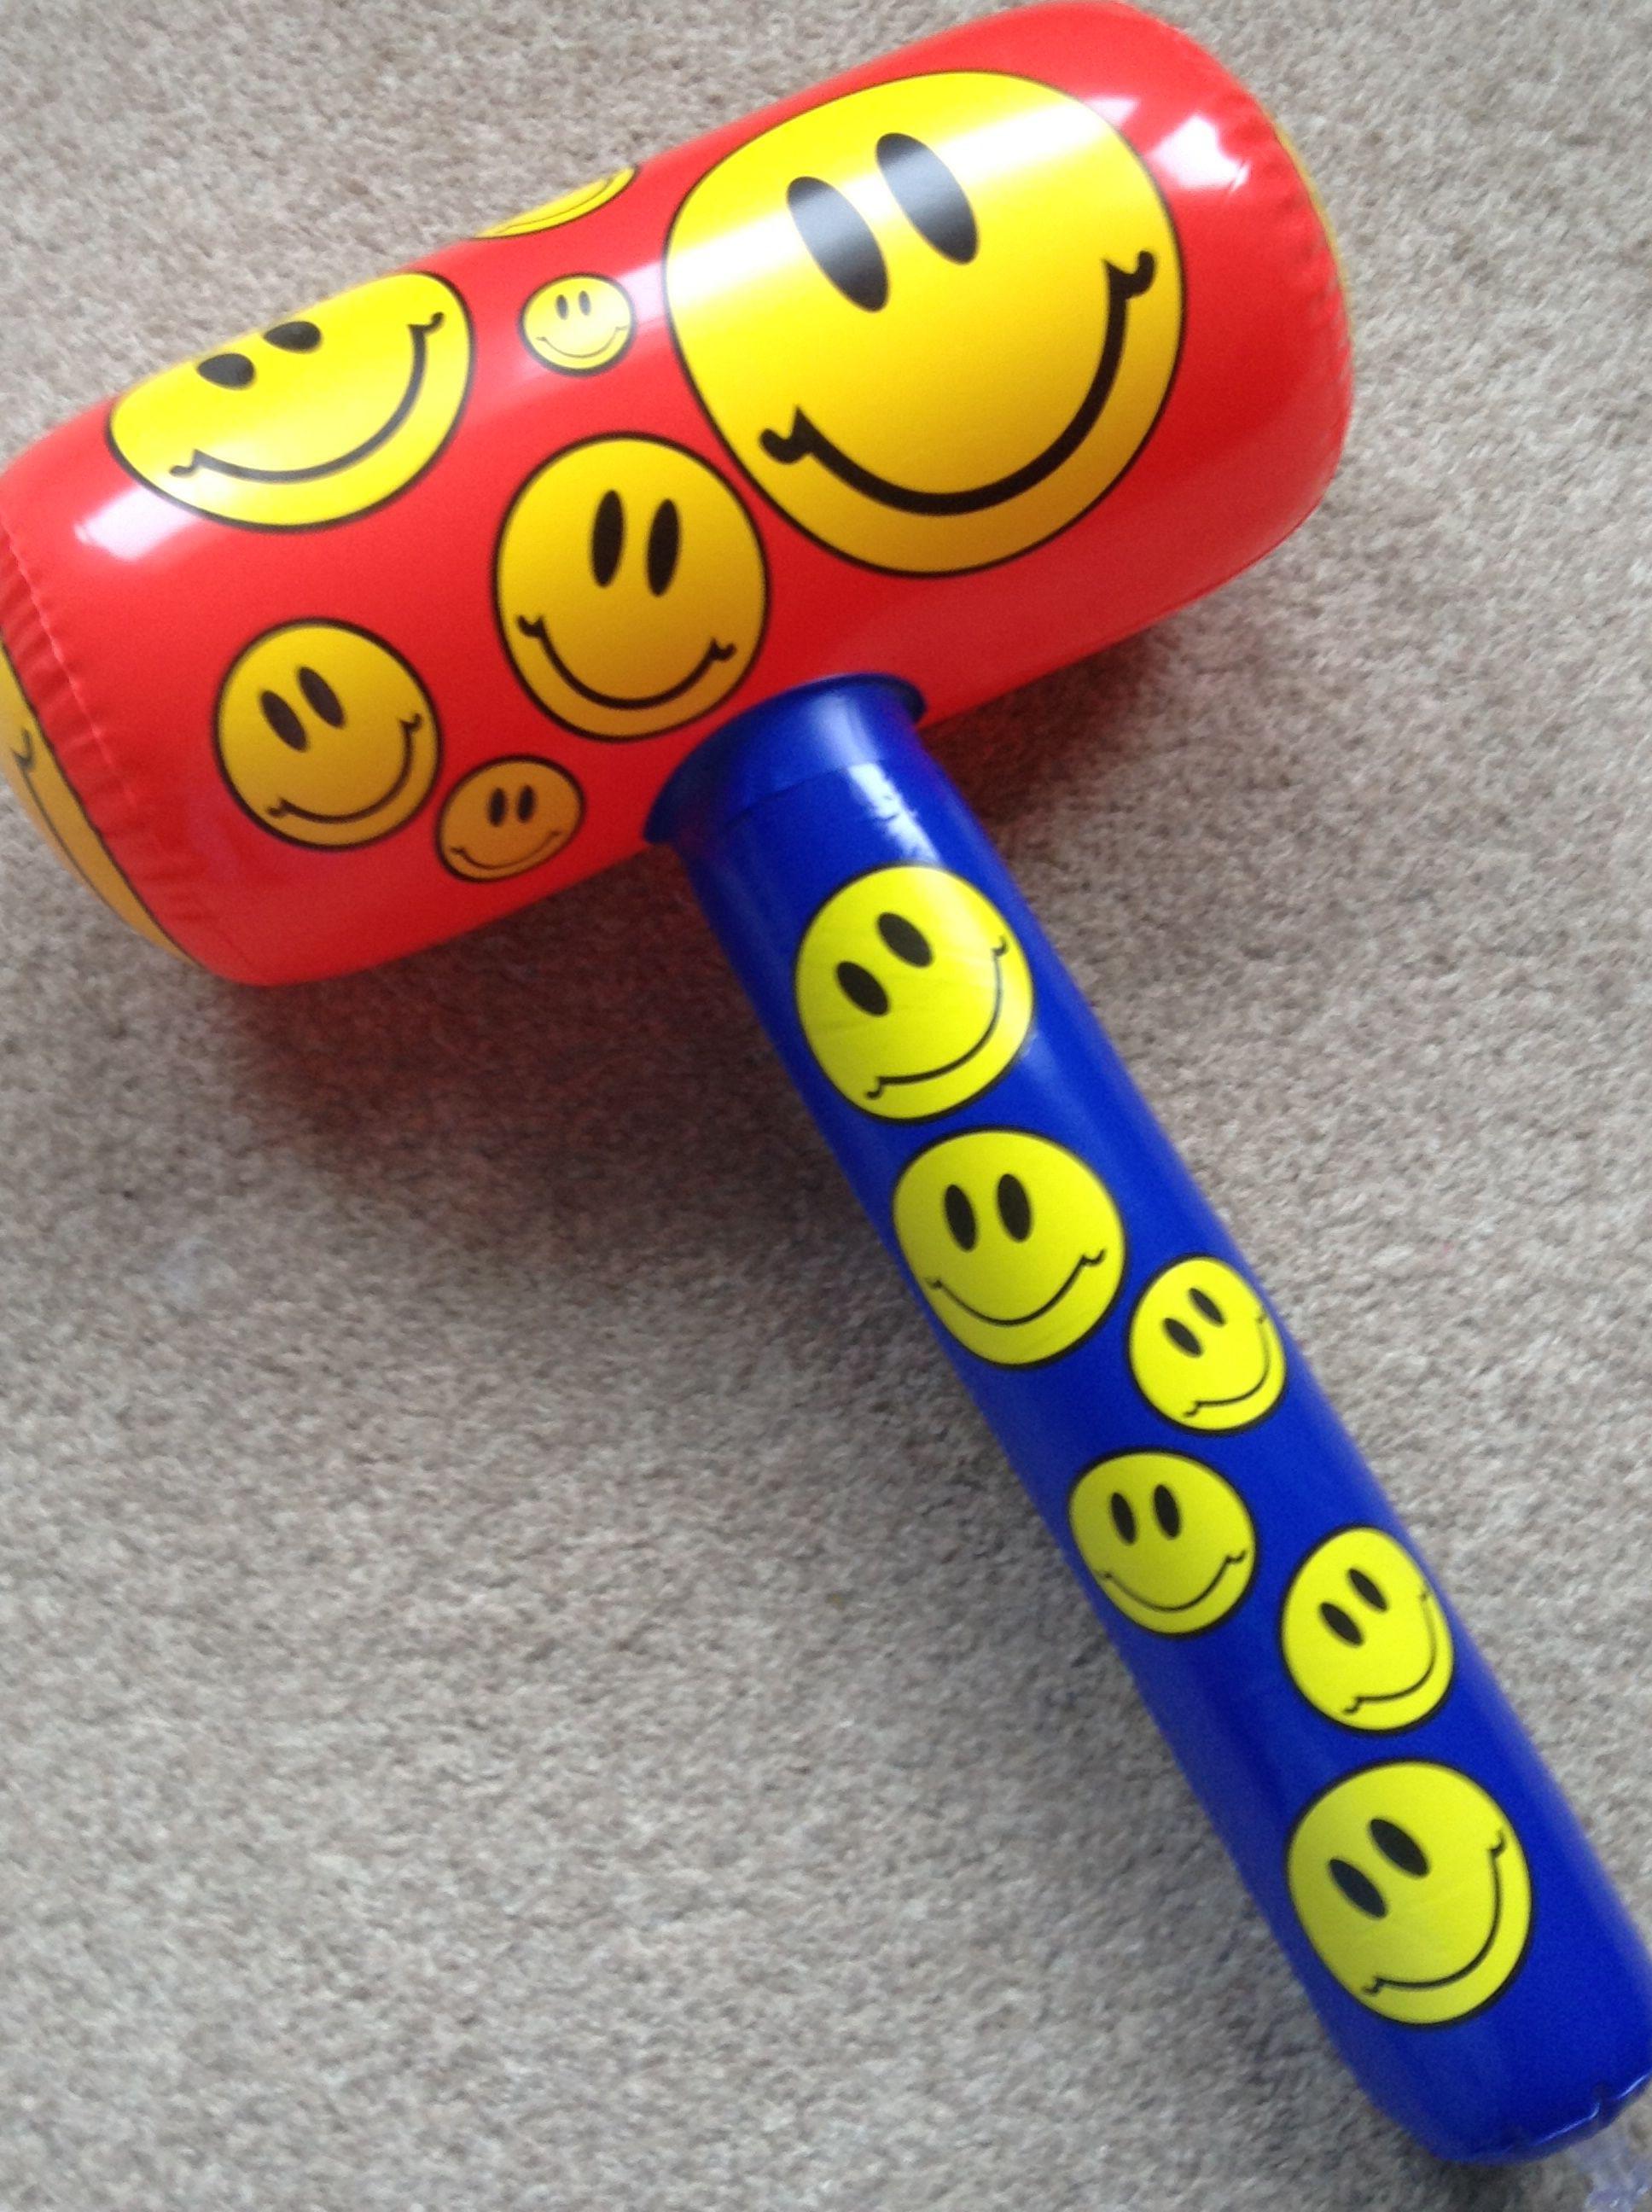 Happy hammer